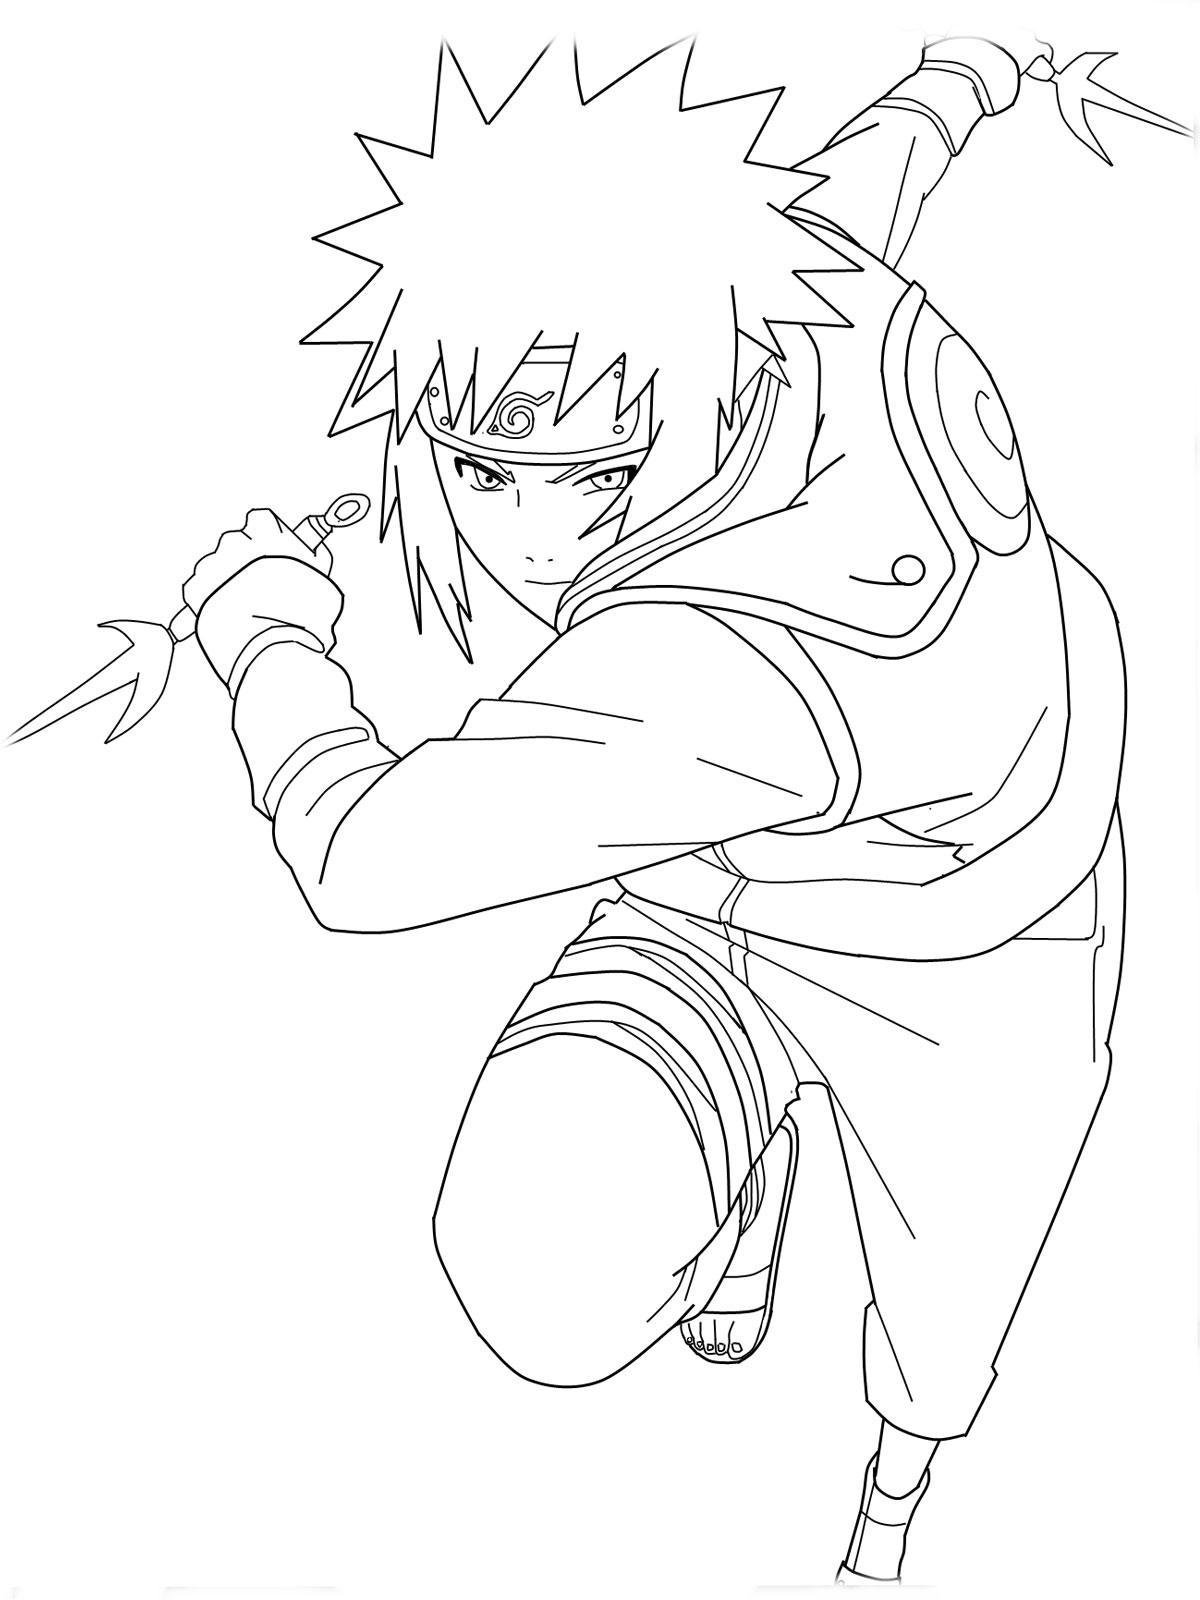 Imagenes Para Dibujar Naruto Shippuden On Log Wall